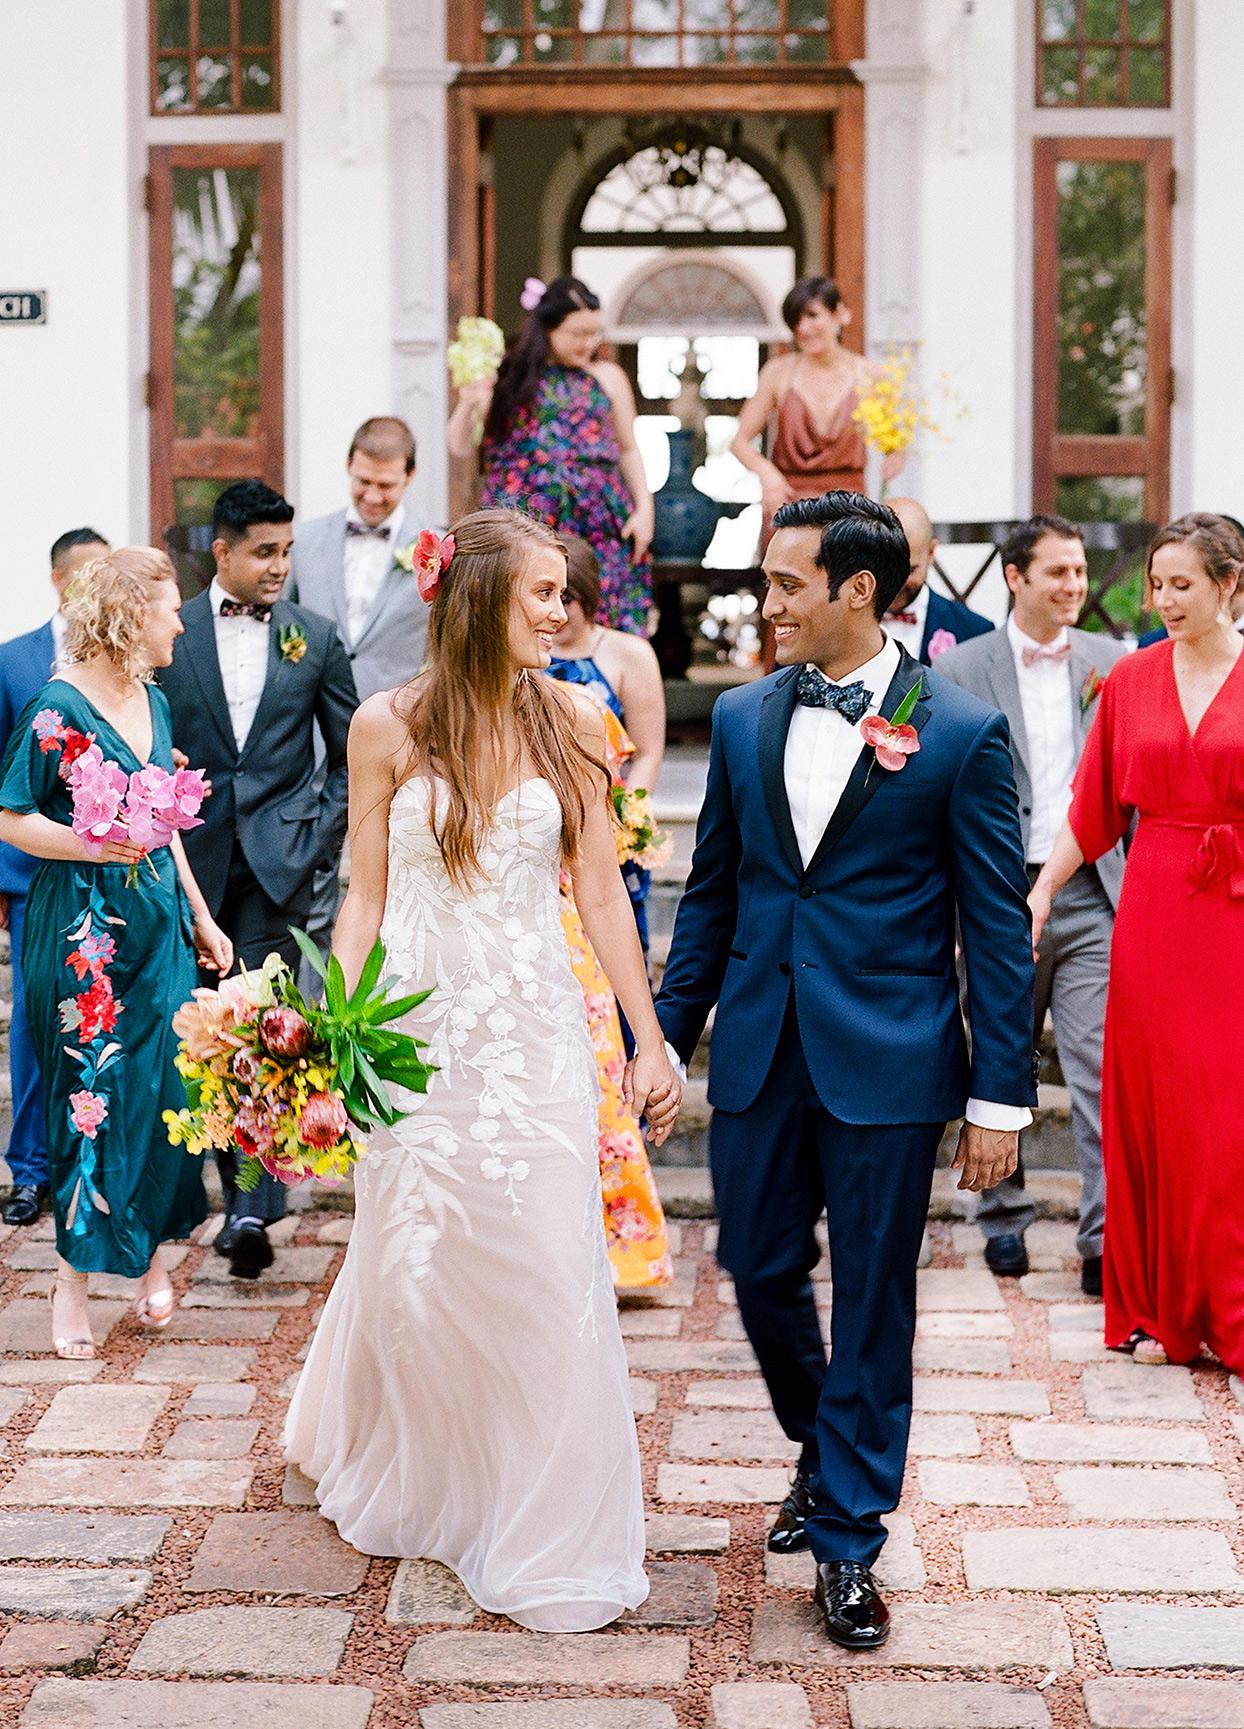 kelly sanjiv wedding couple walking with party